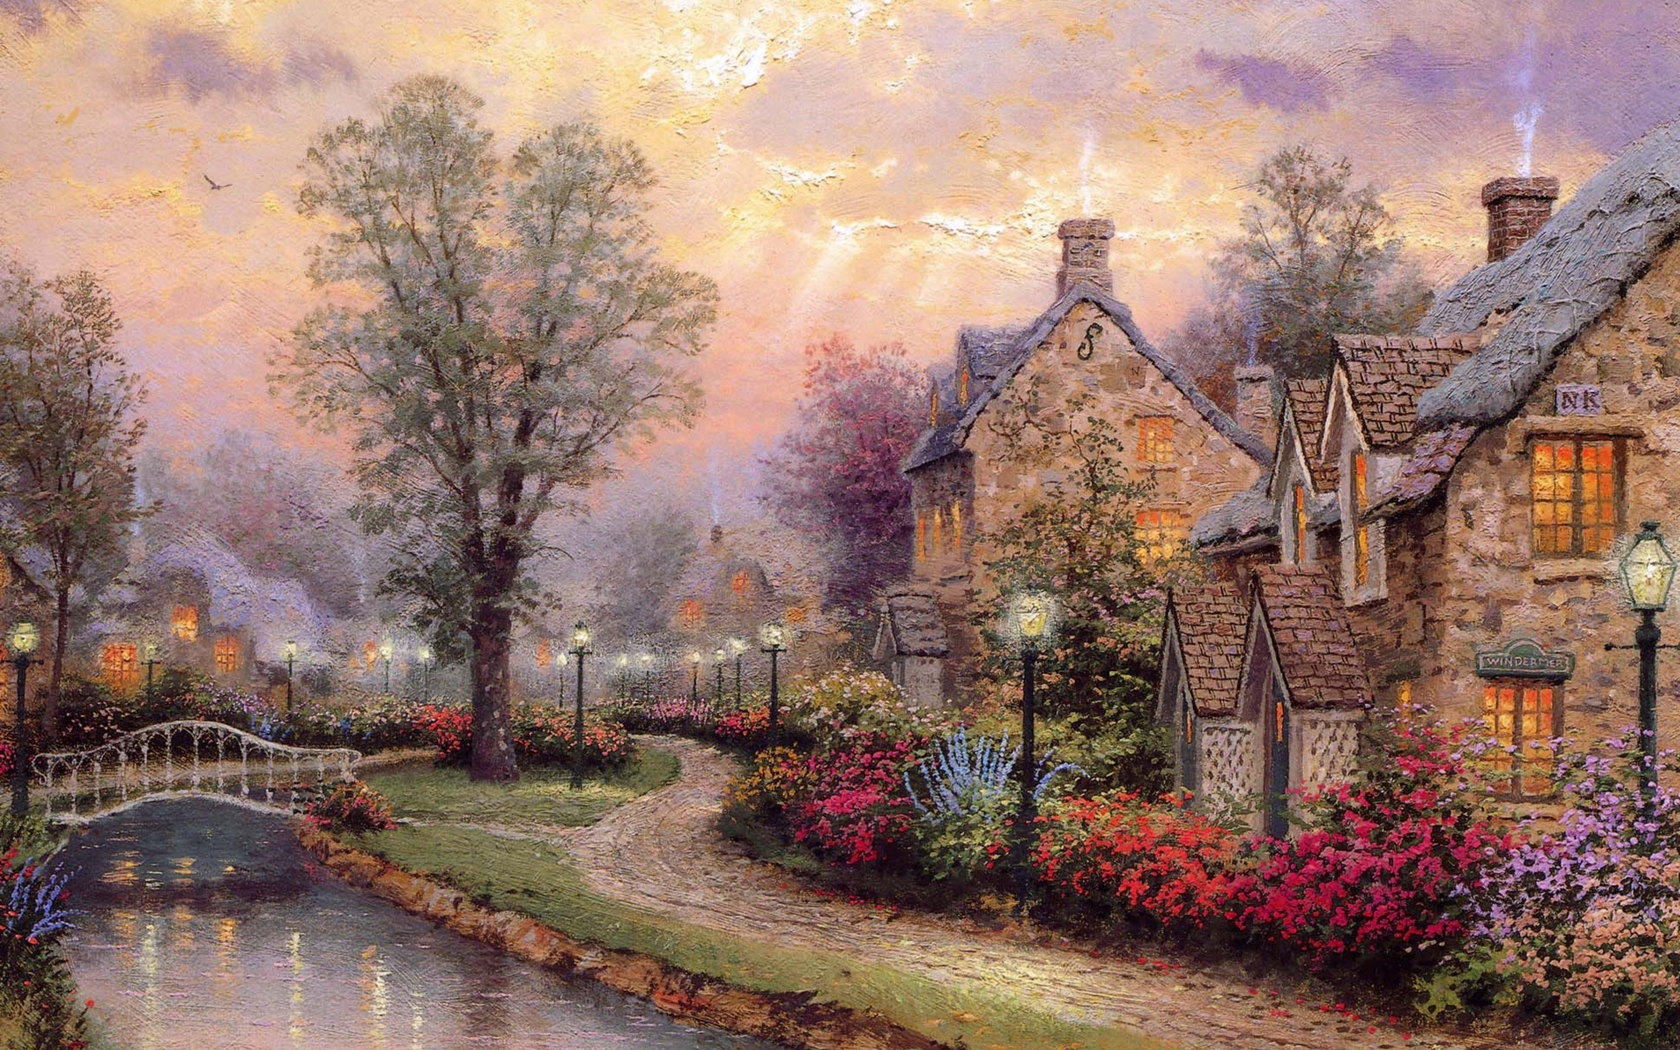 105 1057851 kinkade wallpaper oil paintings artistic oil painting desktop